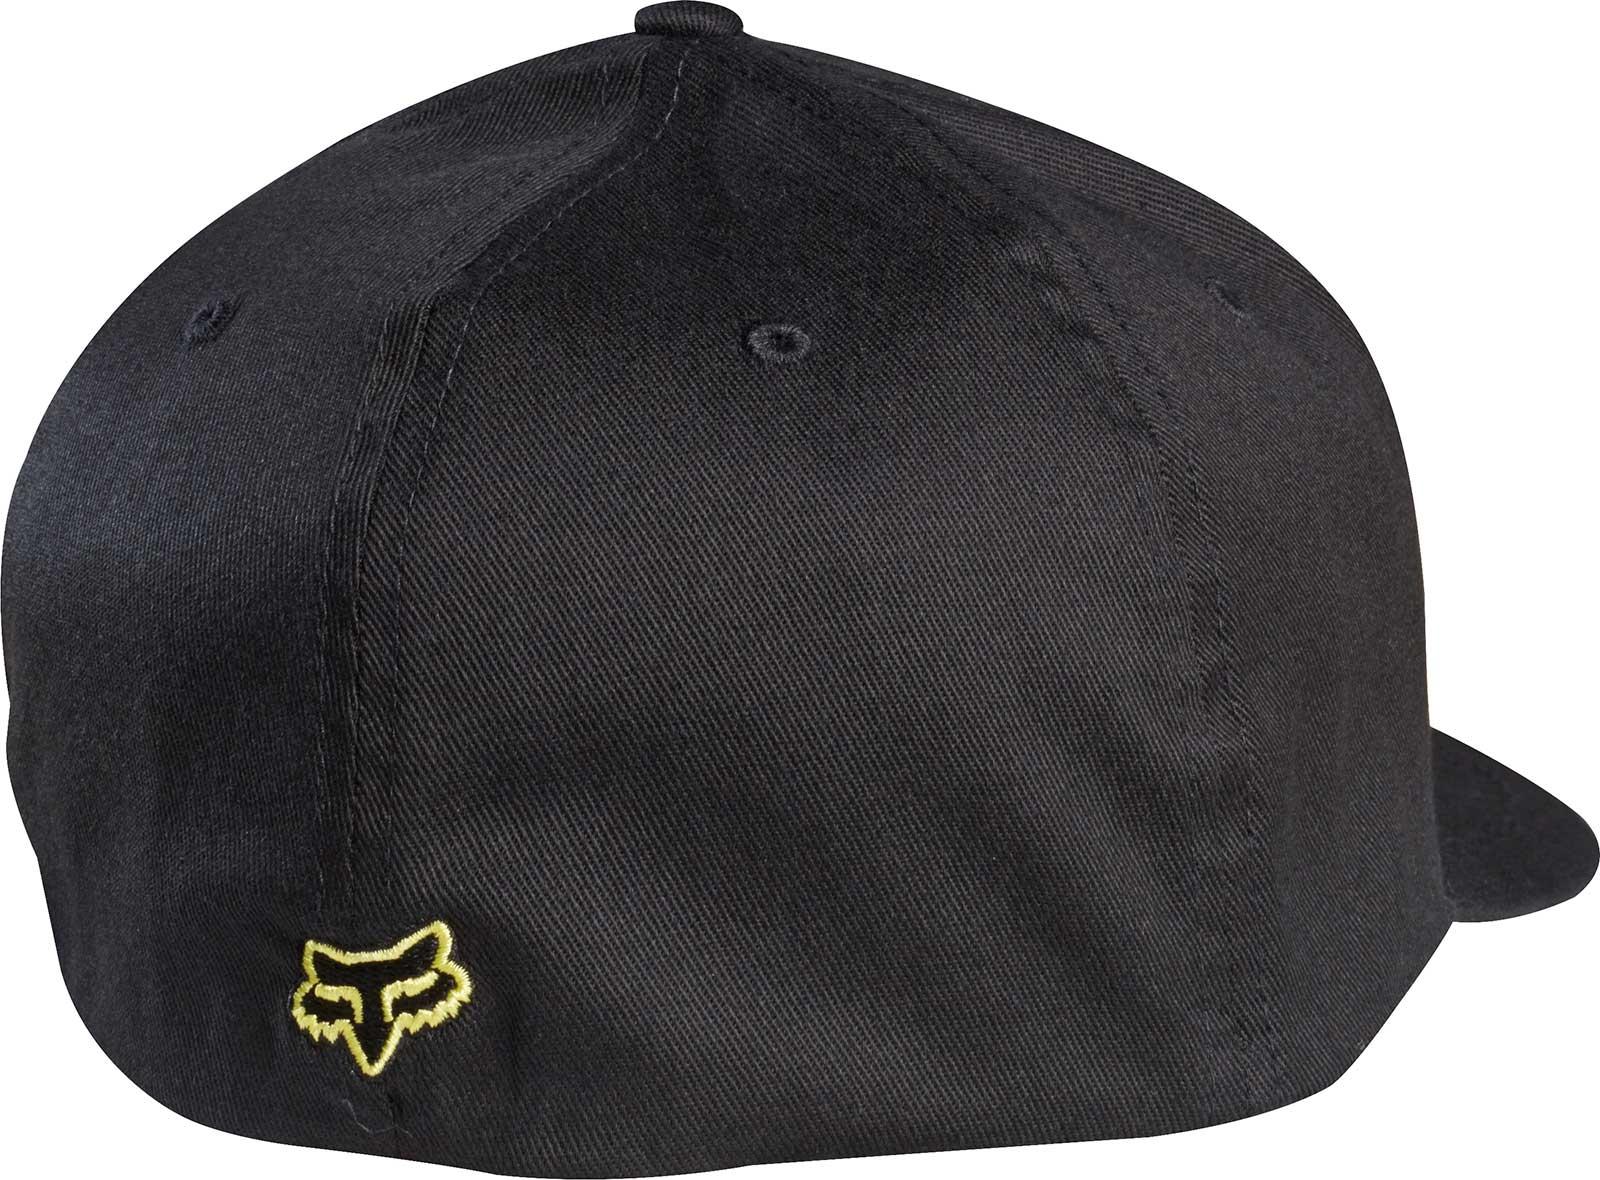 new styles 2900a 0f728 ... where can i buy fox racing flexfit flex 45 flexfit racing hat mens  e38bce da31b 0a07f